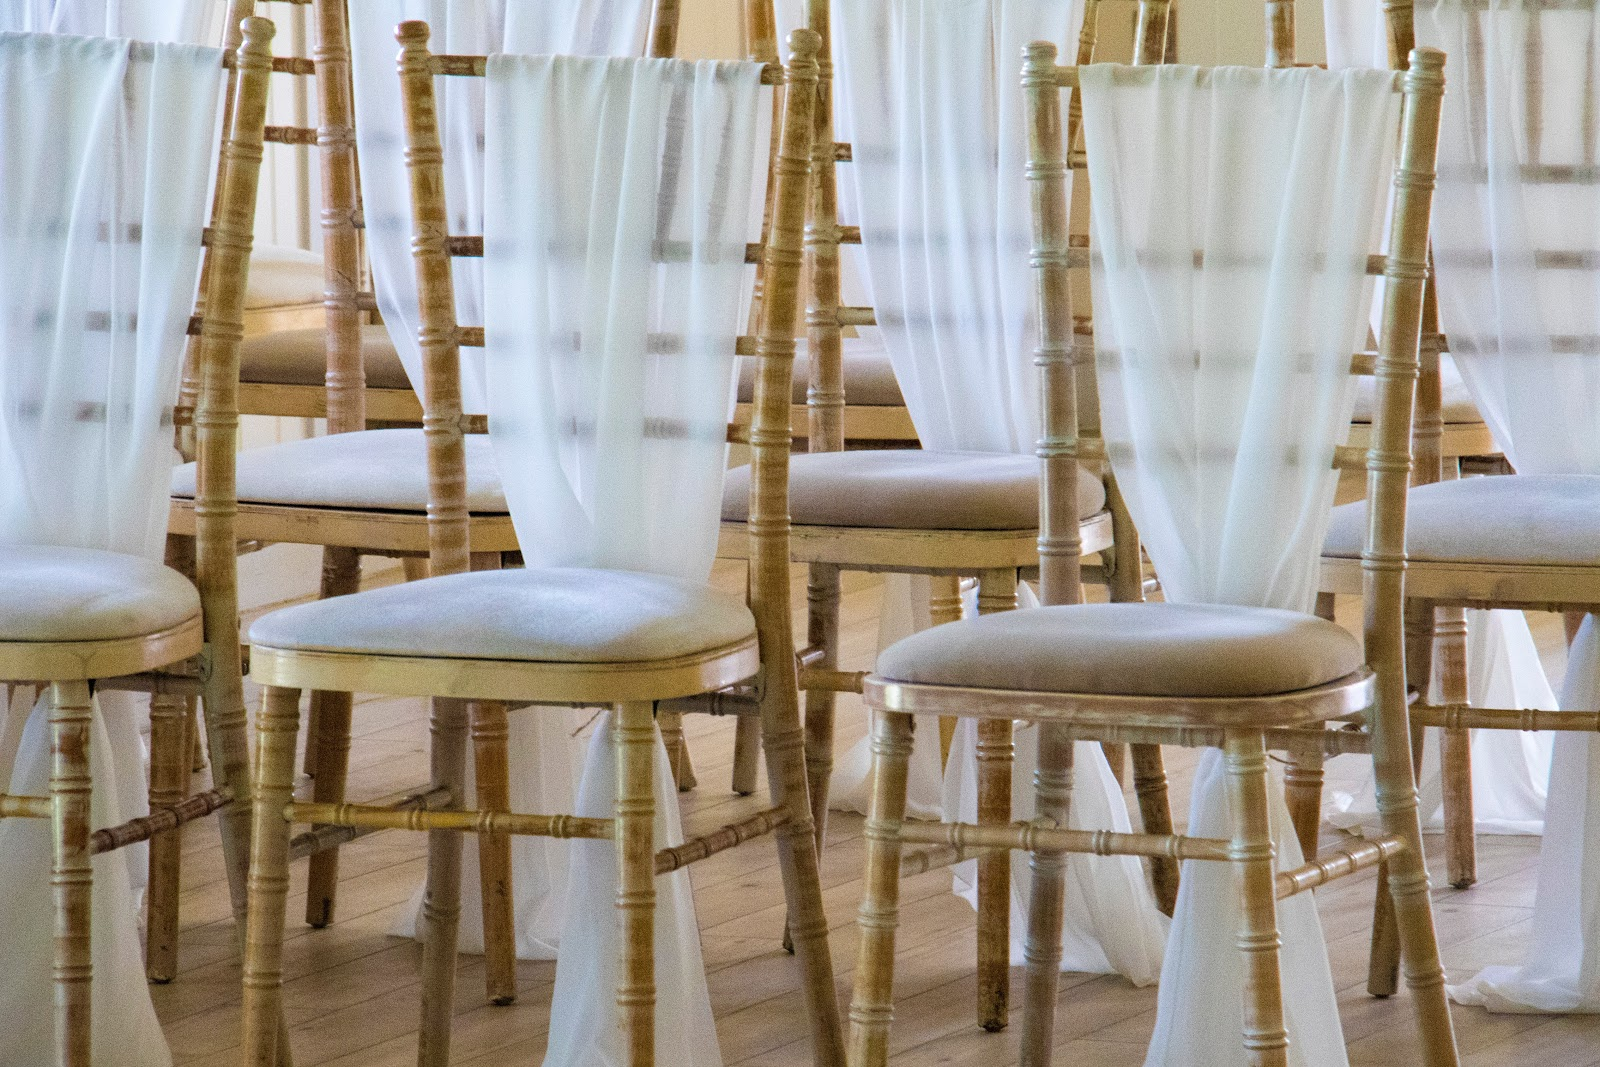 chaise lieu événémentiel mariage